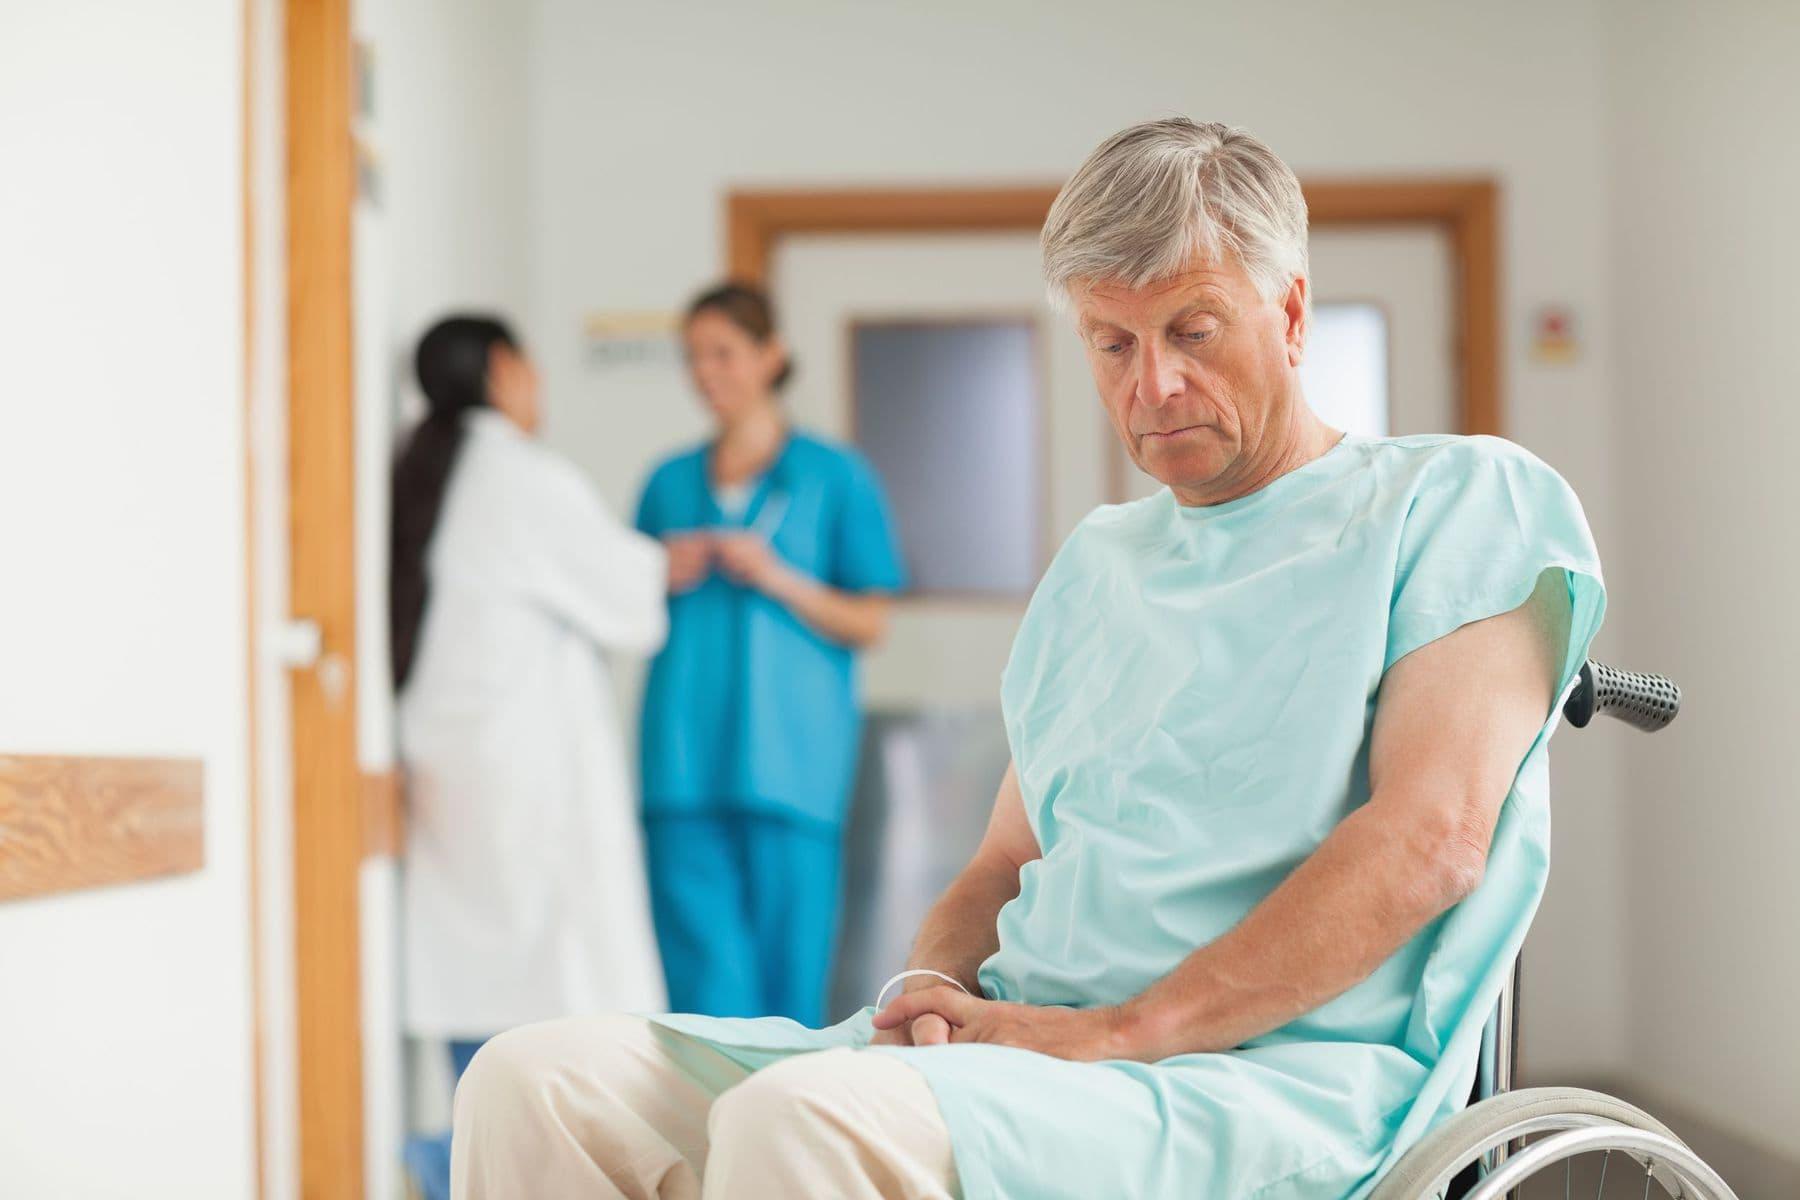 Sad elderly man with dementia in the corridor of hospital